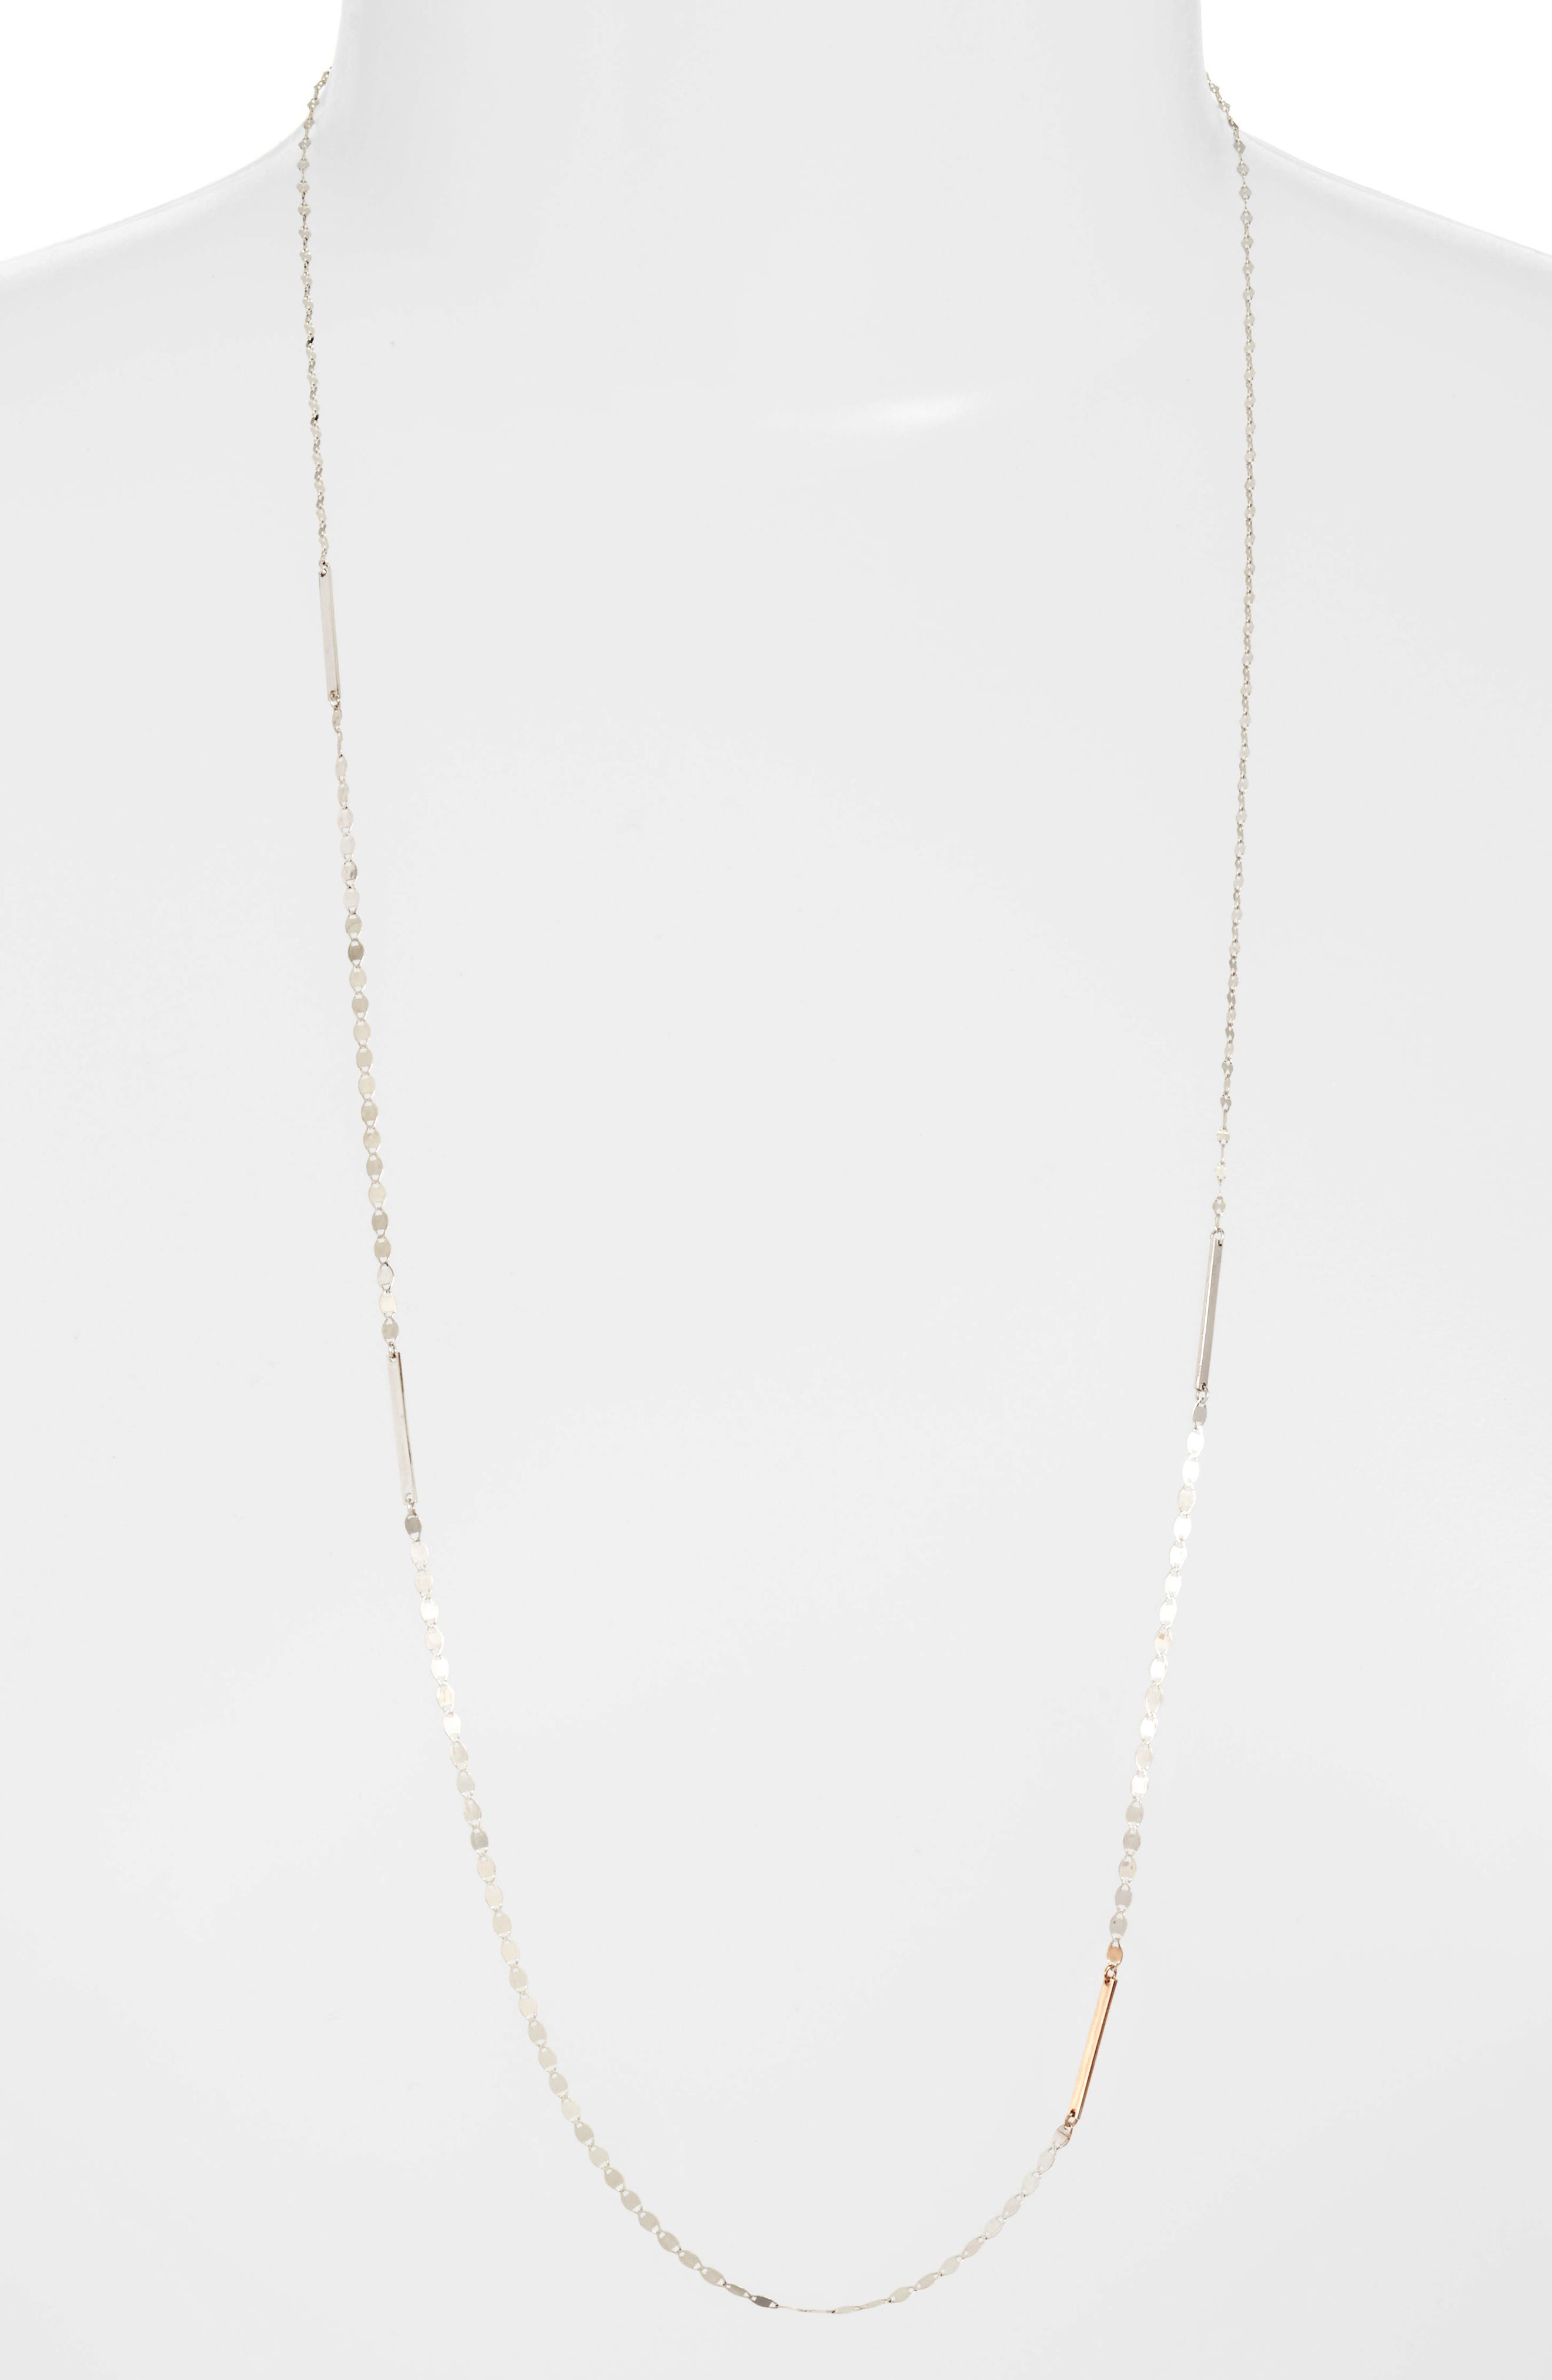 Nude Remix Bar Long Necklace,                             Main thumbnail 1, color,                             White Gold